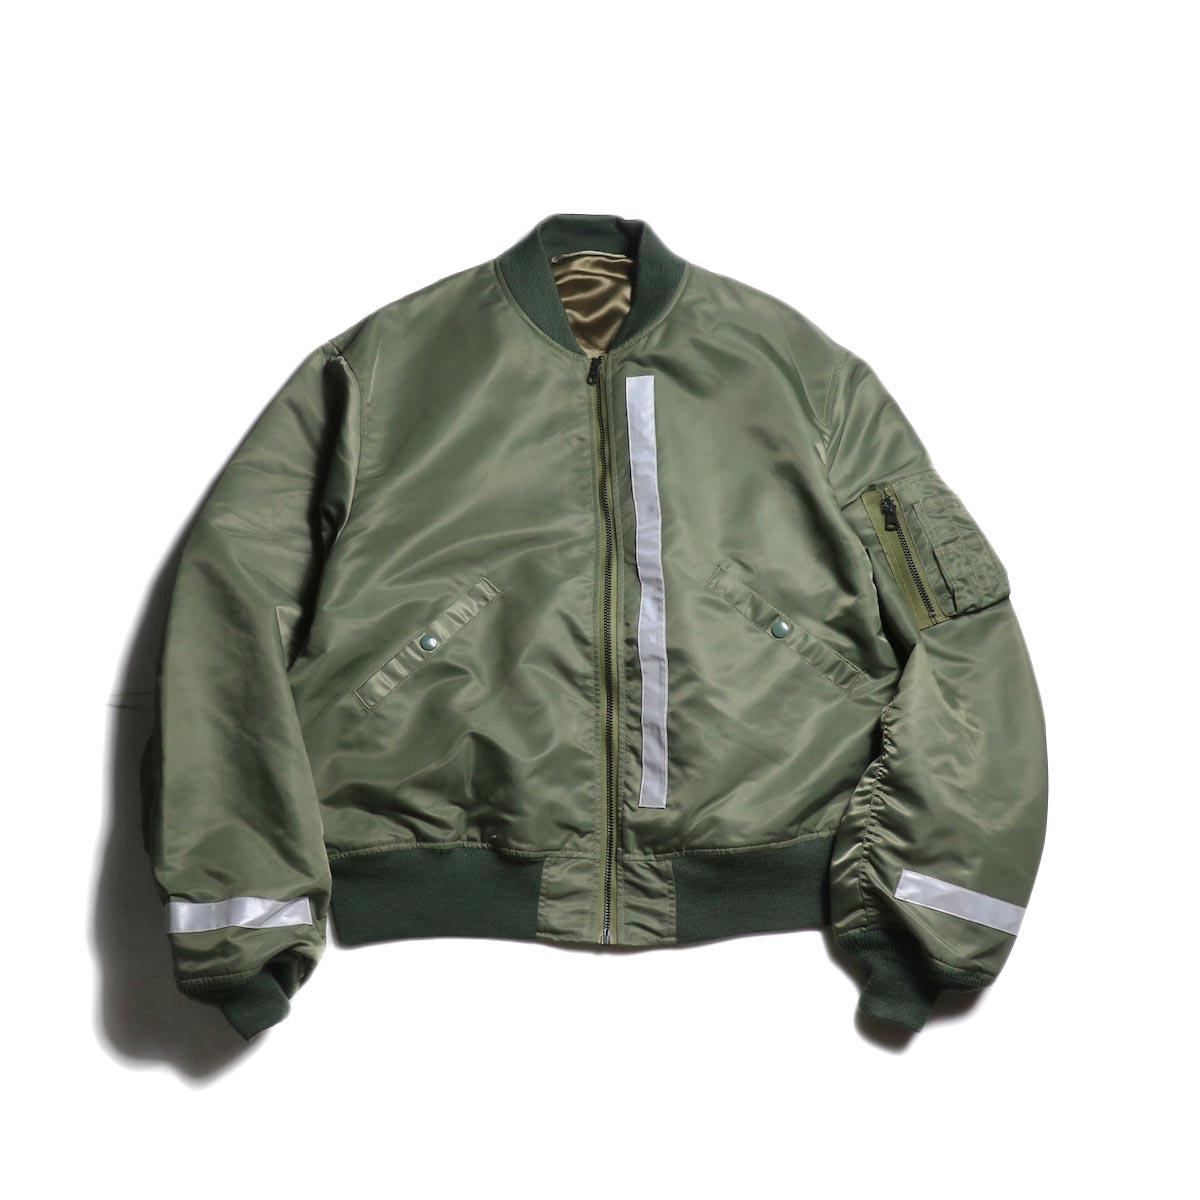 UNUSED × Buzz Rickson's / US1640 Reversible Flight Jacket (Sage Green)